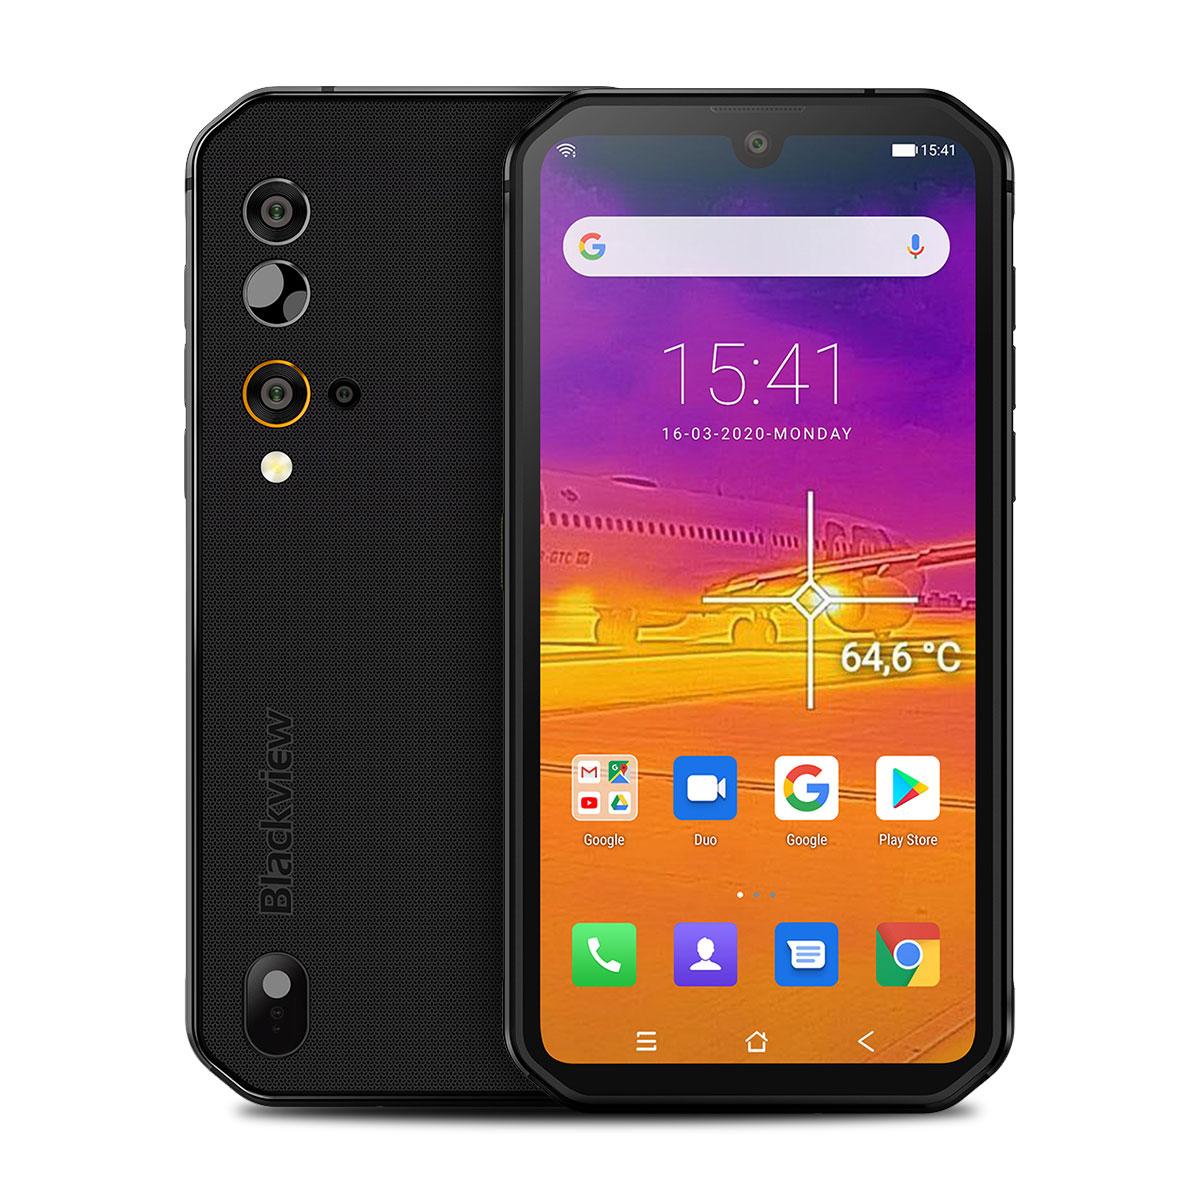 Blackview BV9900 Pro Thermal Camera Mobile Phone Helio P90 Octa Core 8GB+128GB IP68 Rugged Smartphone 48MP Quad Rear Camera Silver_Non-European regulations